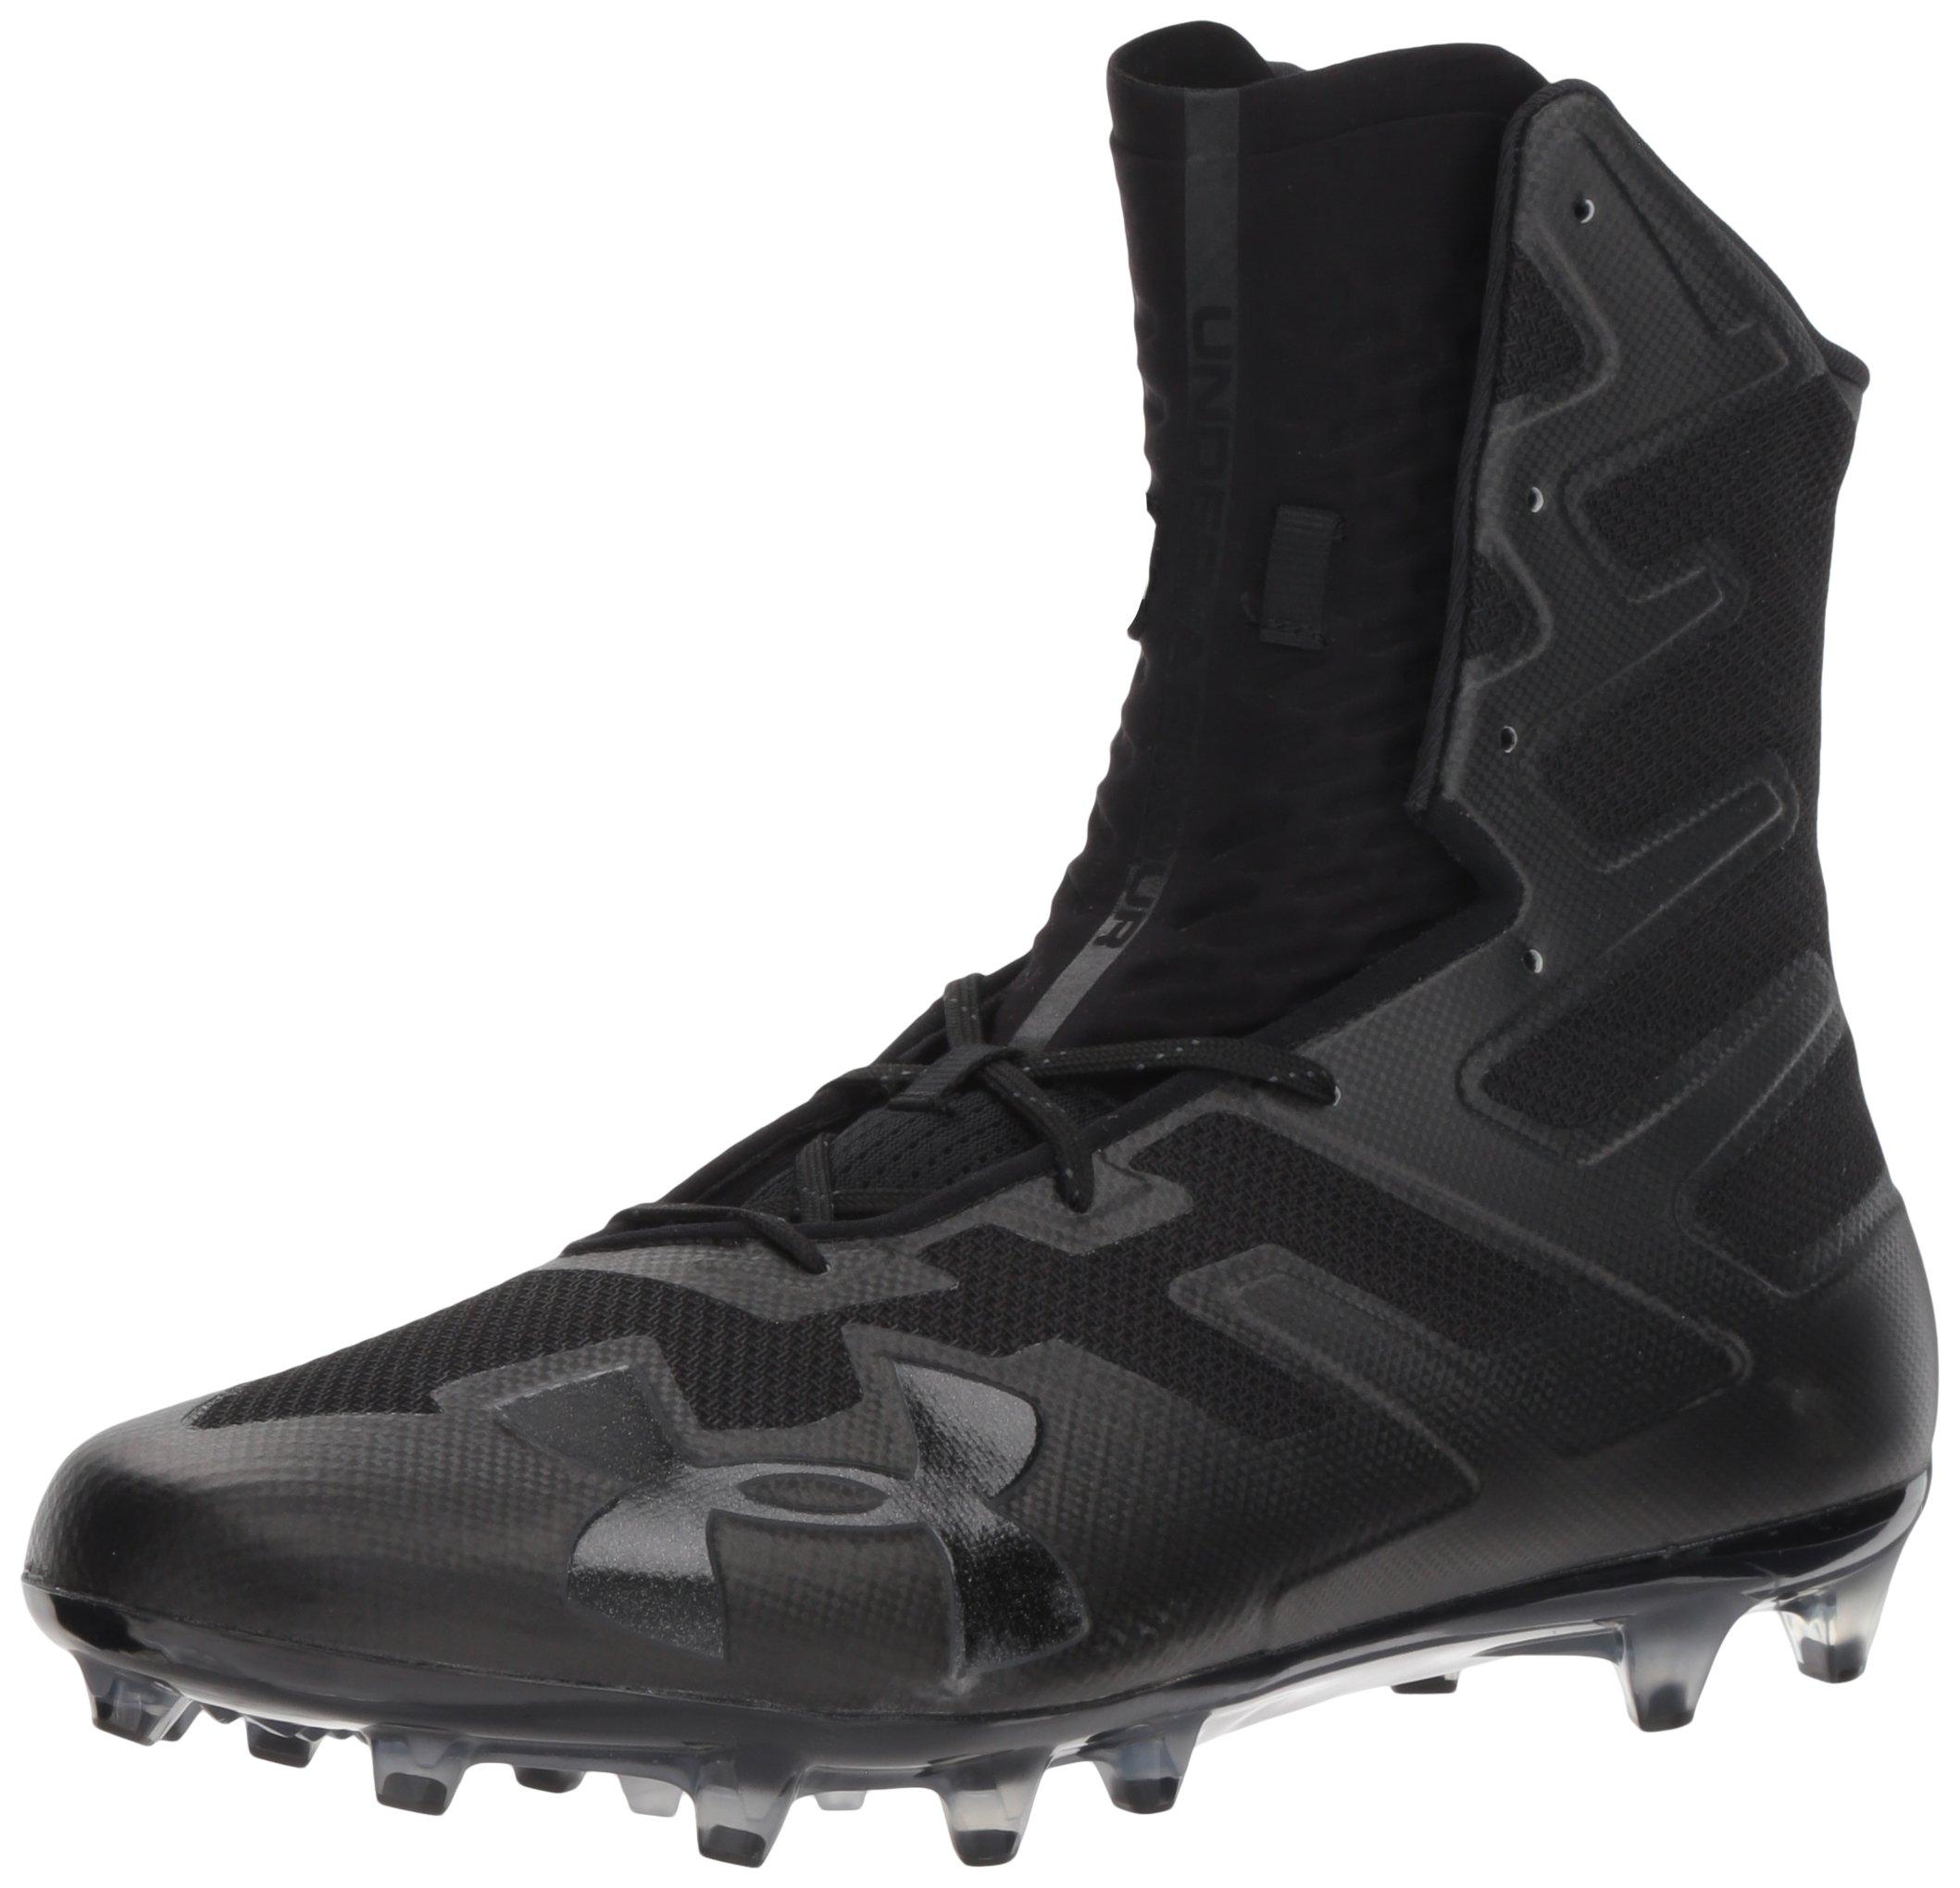 Under Armour Men's Highlight MC Football Shoe, 001/Black, 12 by Under Armour